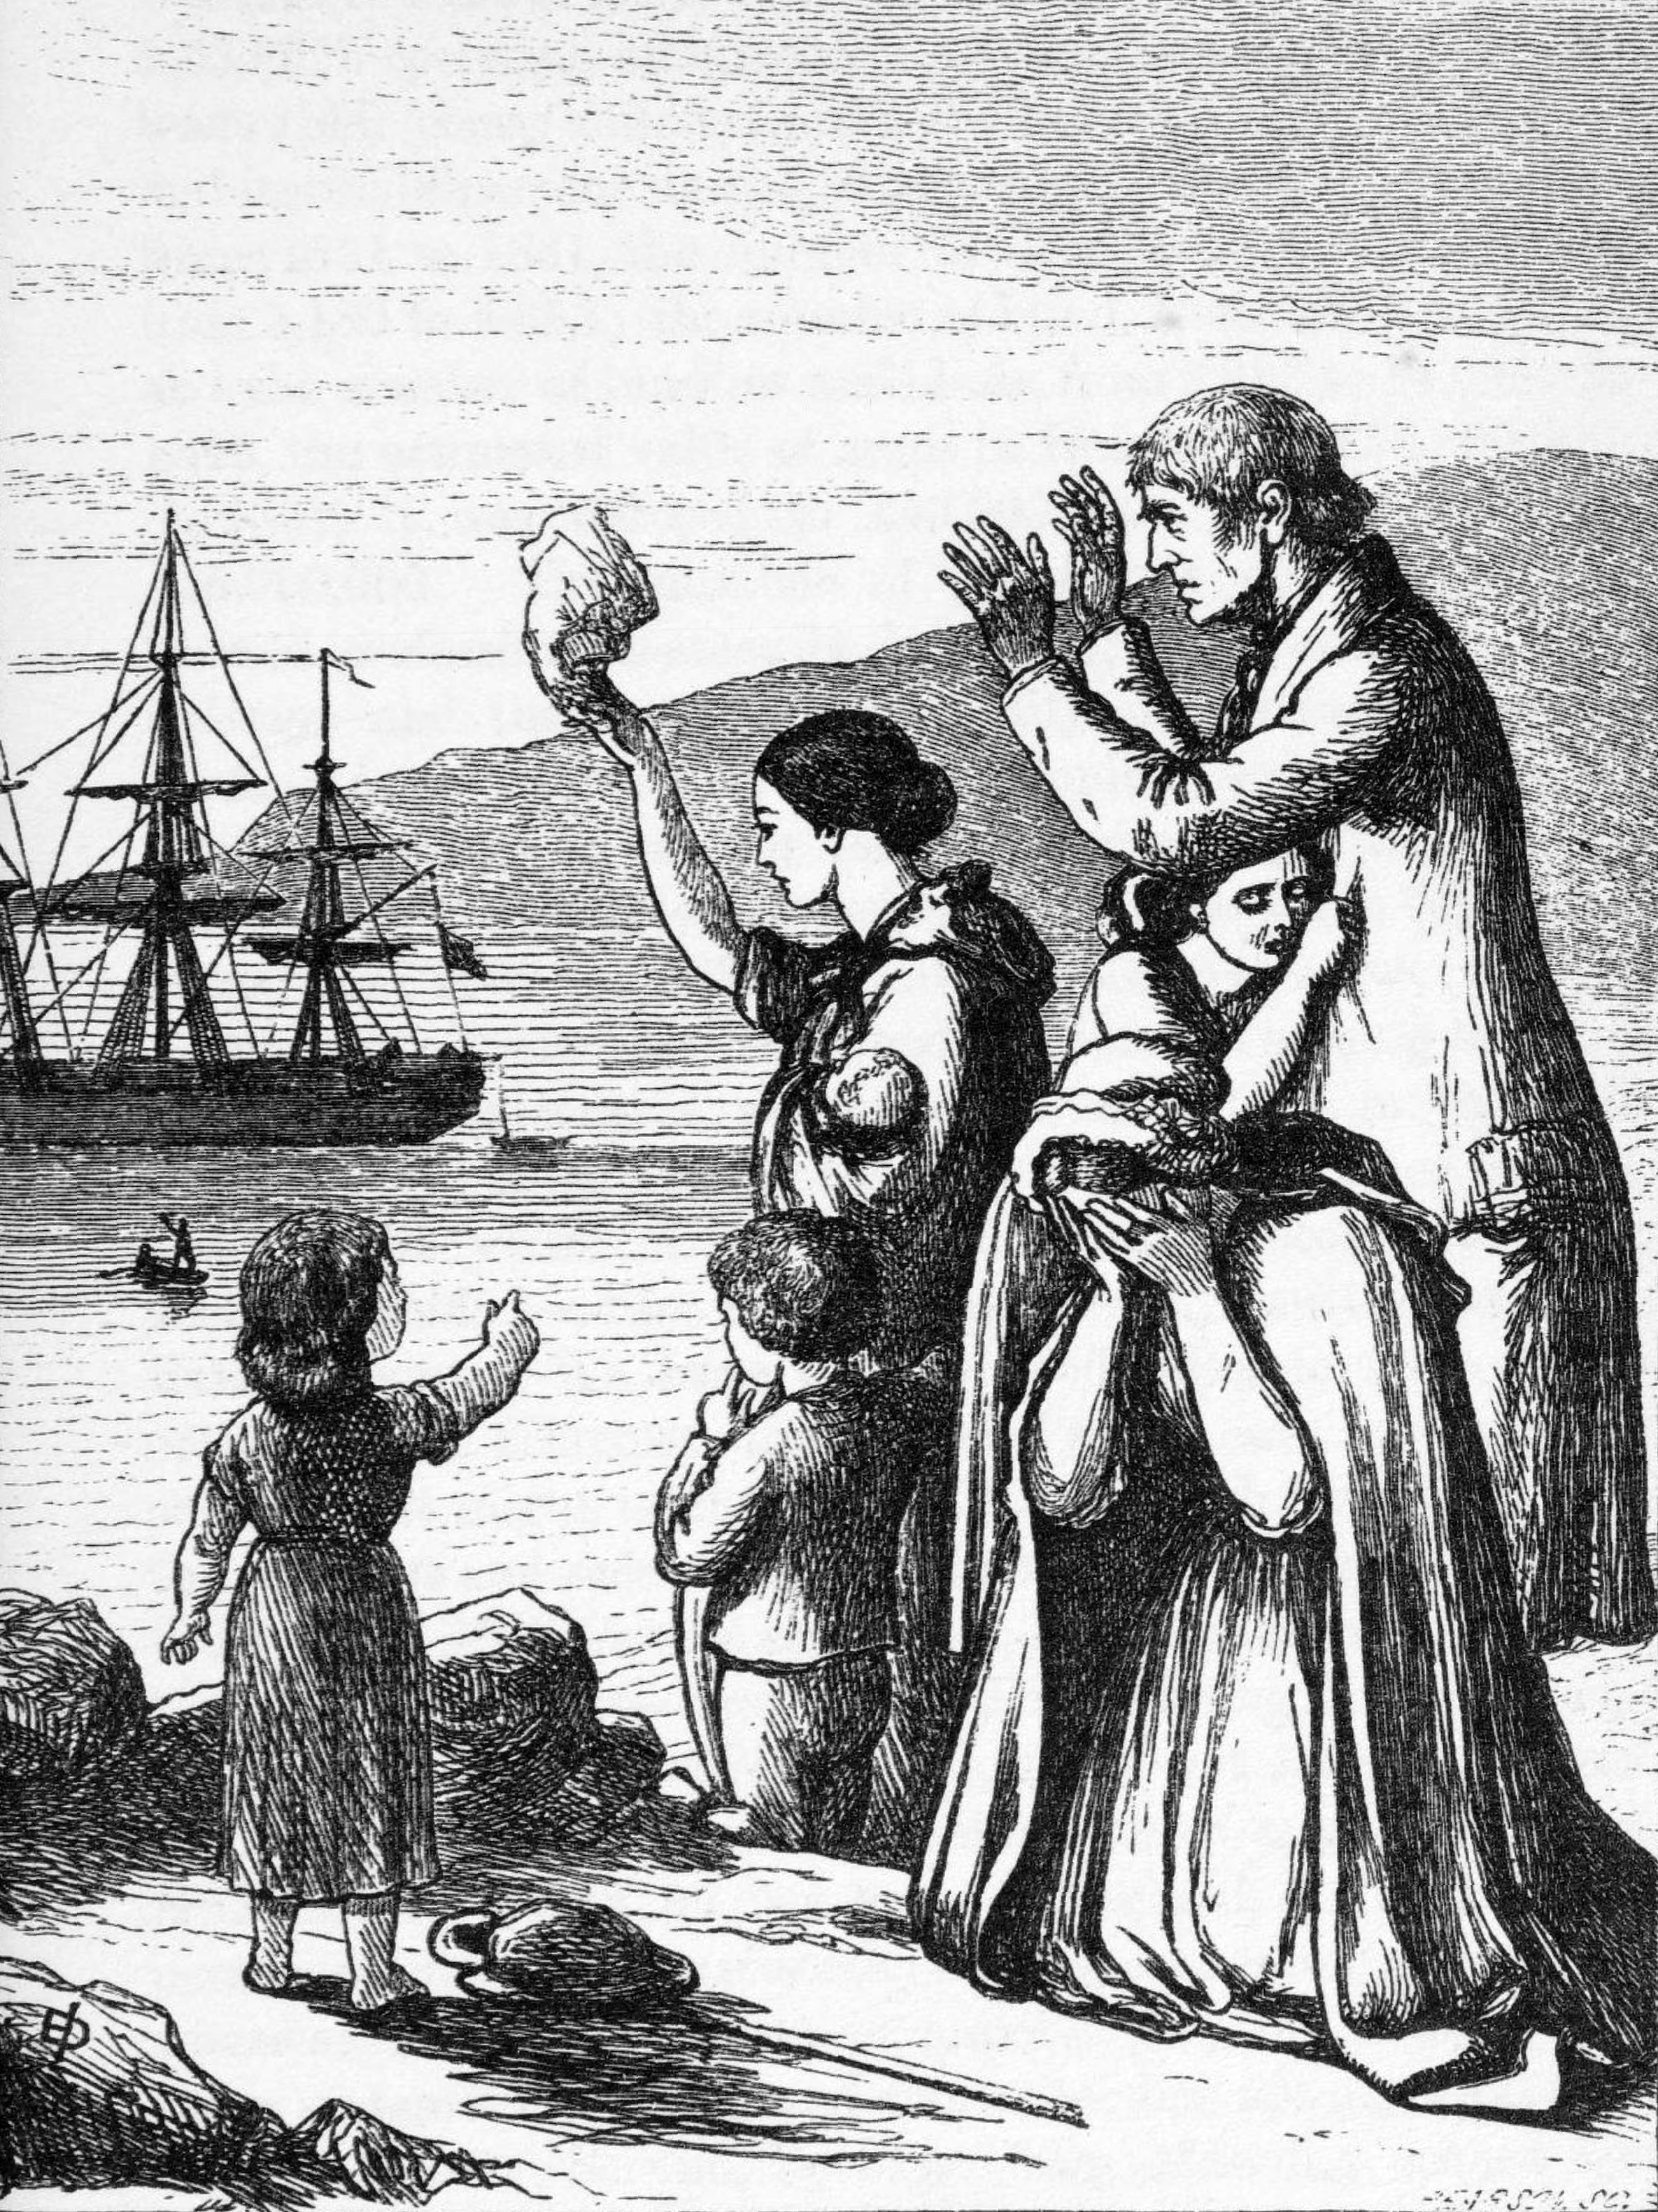 Engraving of Emigrants Leaving Ireland, 1868, Henry Doyle